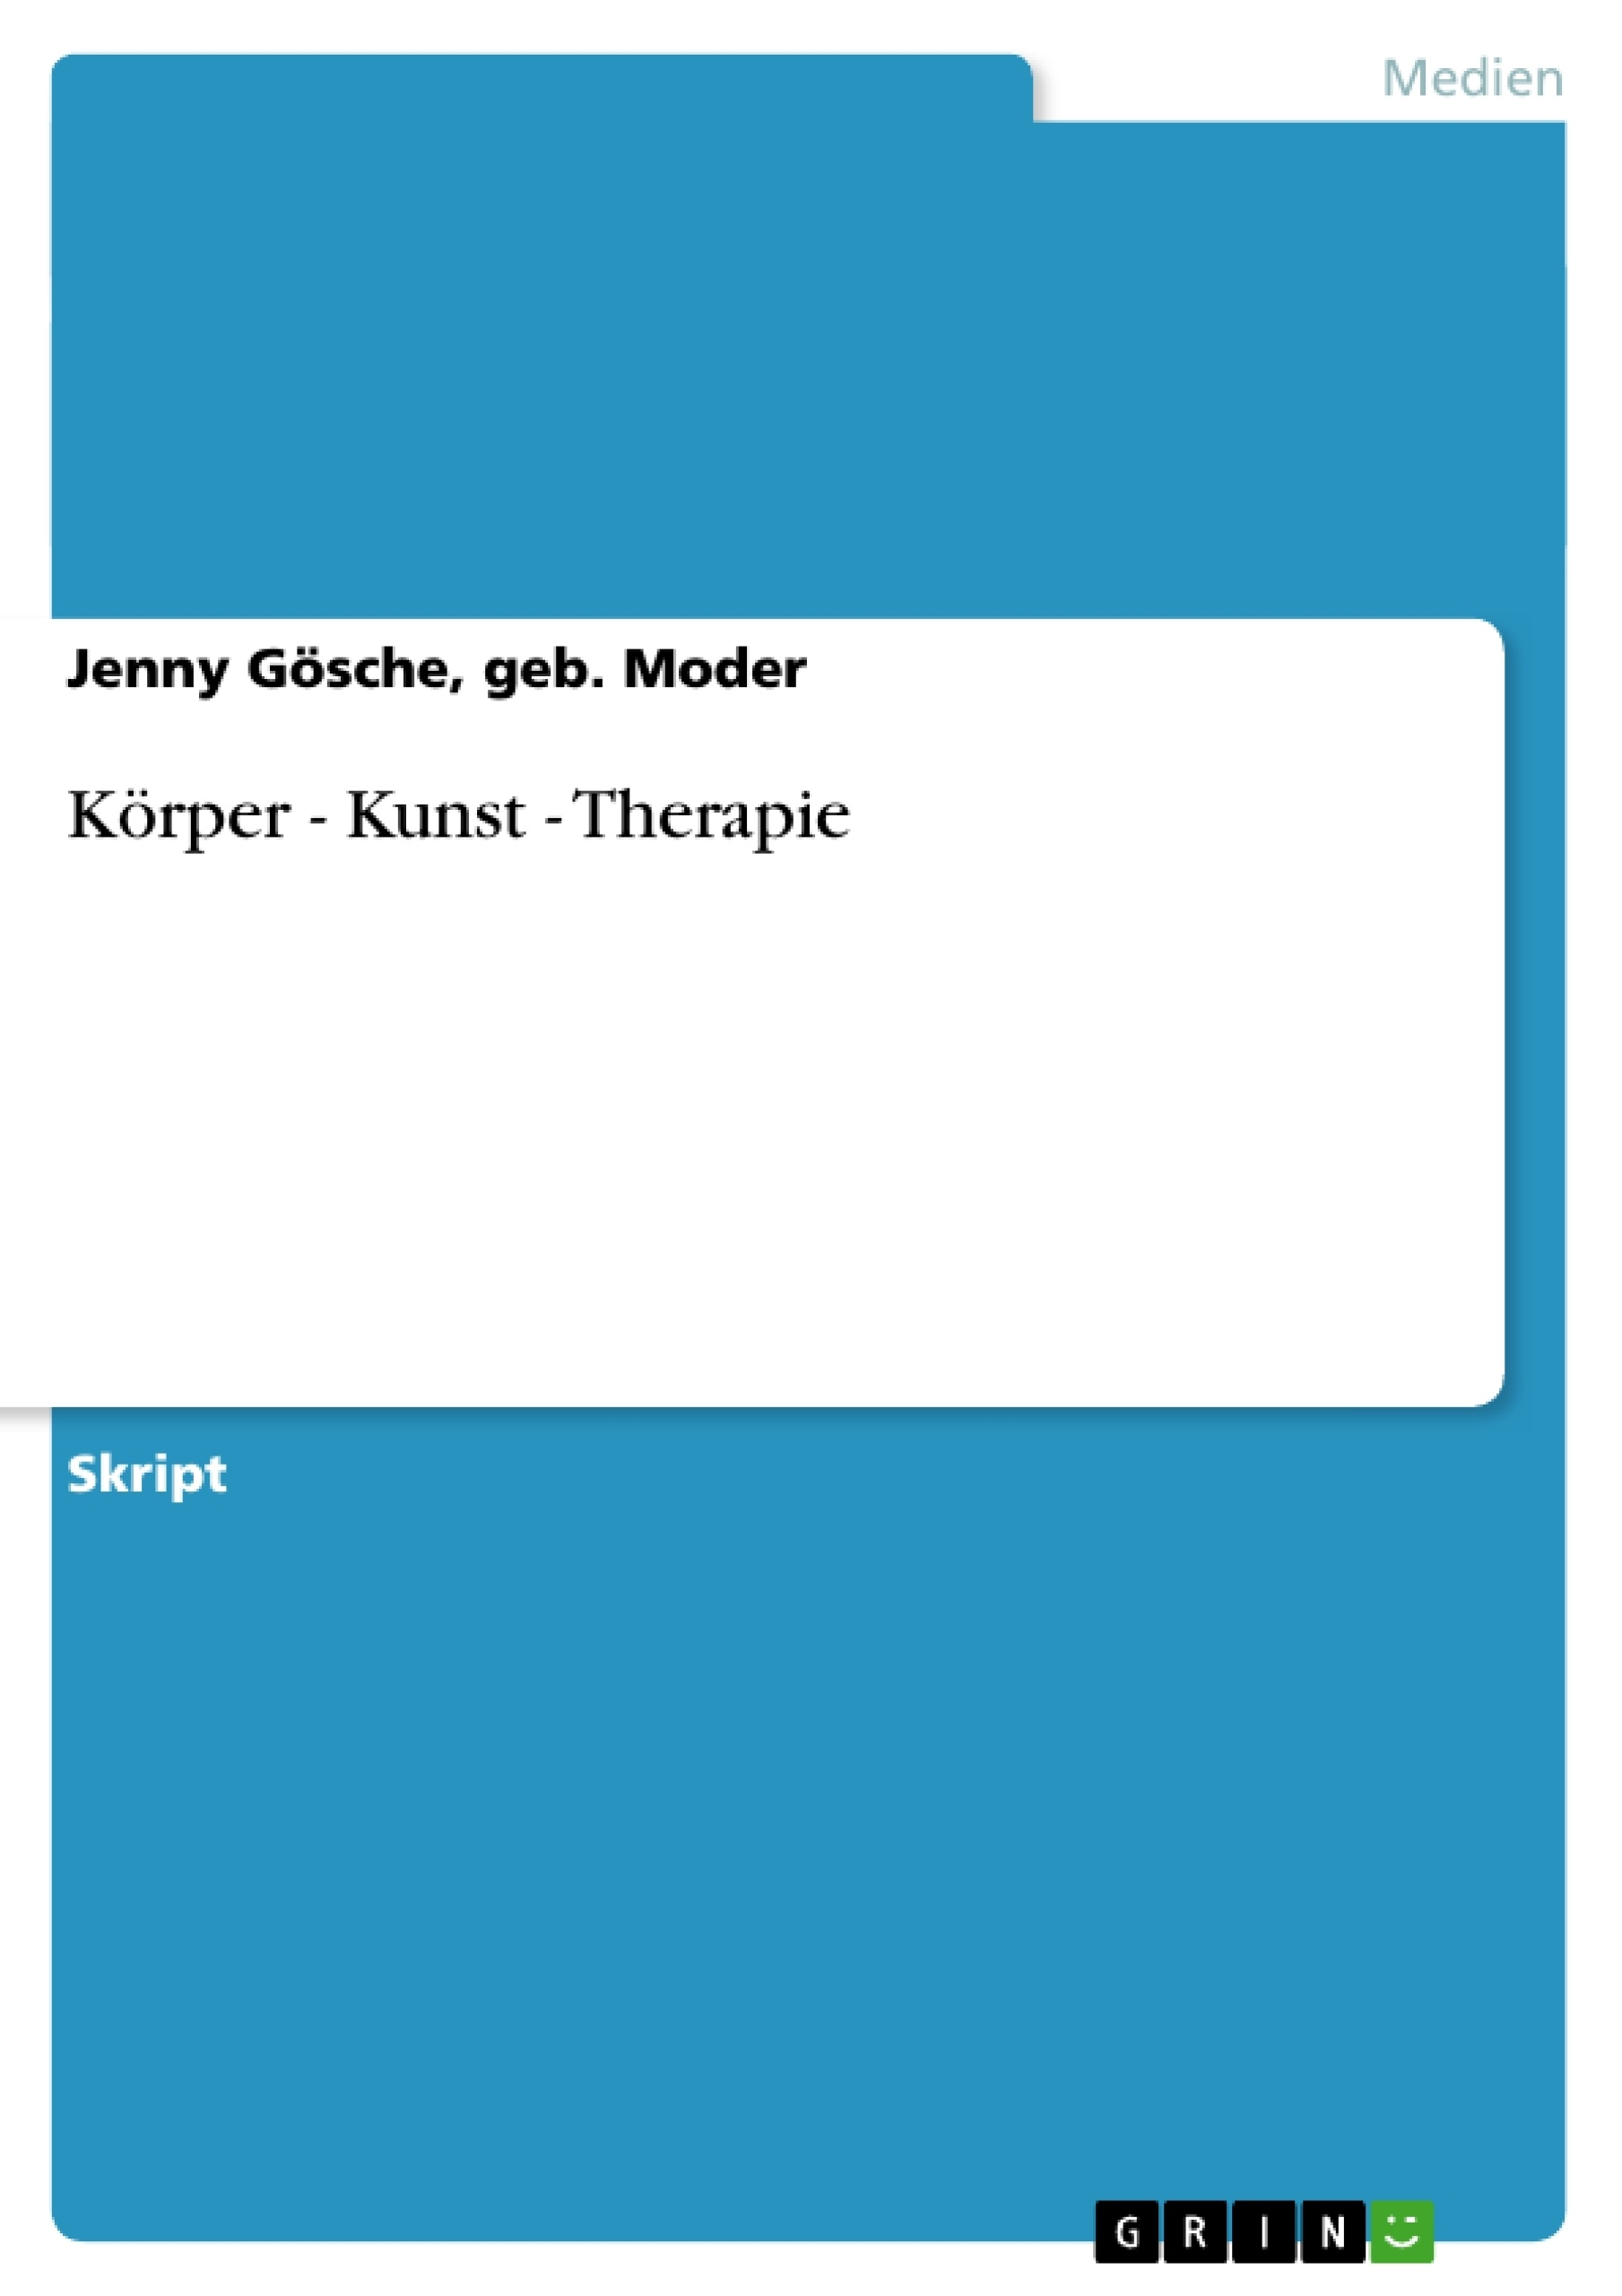 Titel: Körper - Kunst - Therapie